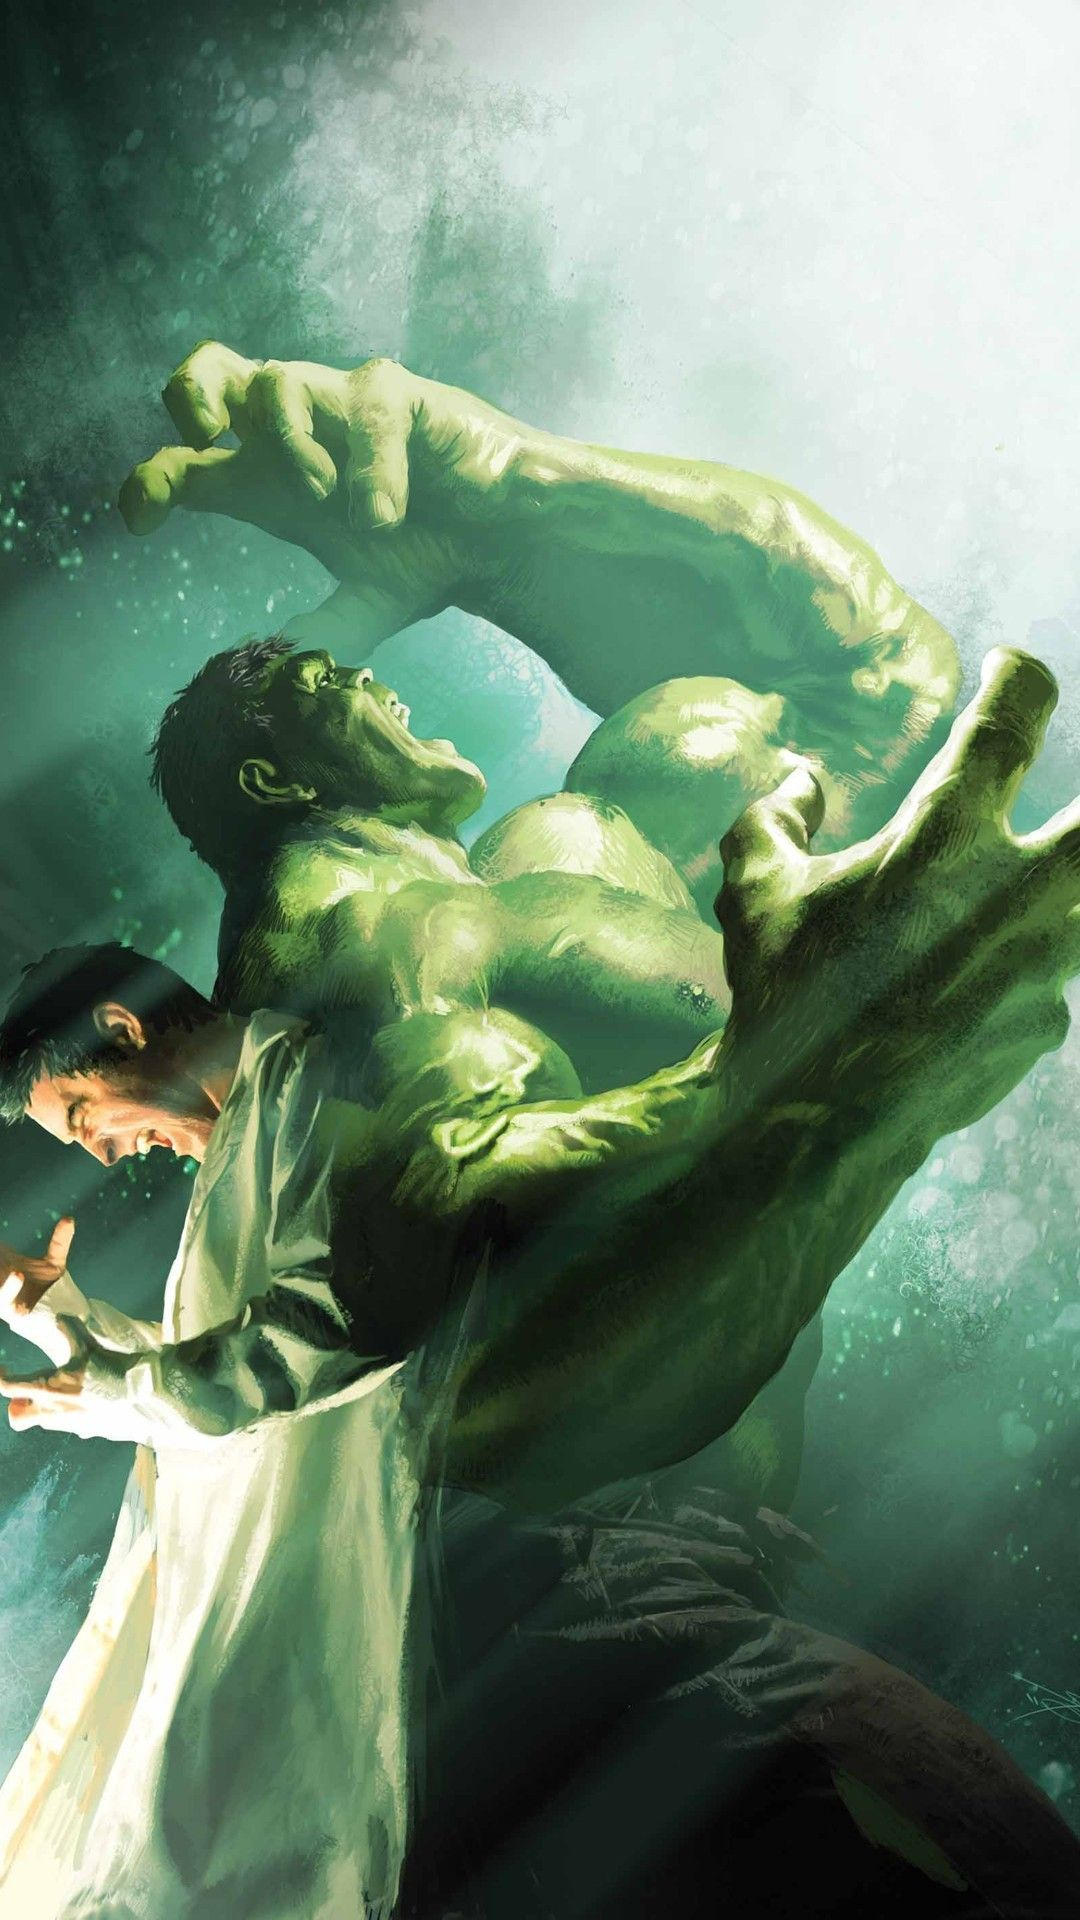 Bruce Banner turning into the Hulk Mobile Wallpaper 5433 1080x1920